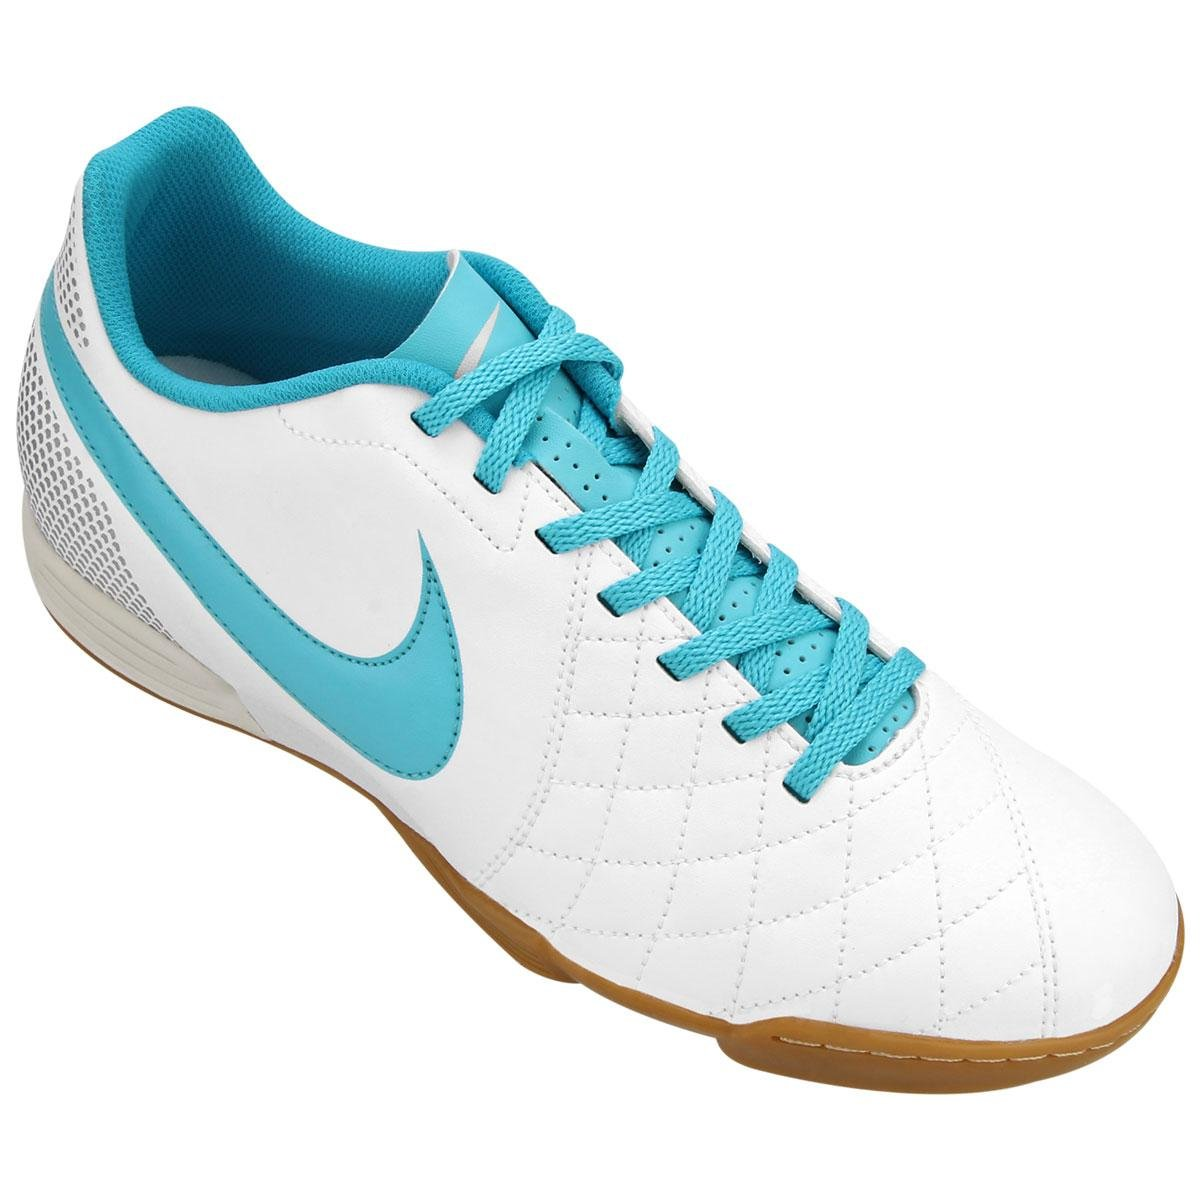 9f0152f6b5 Chuteira Nike Flare IC - Compre Agora